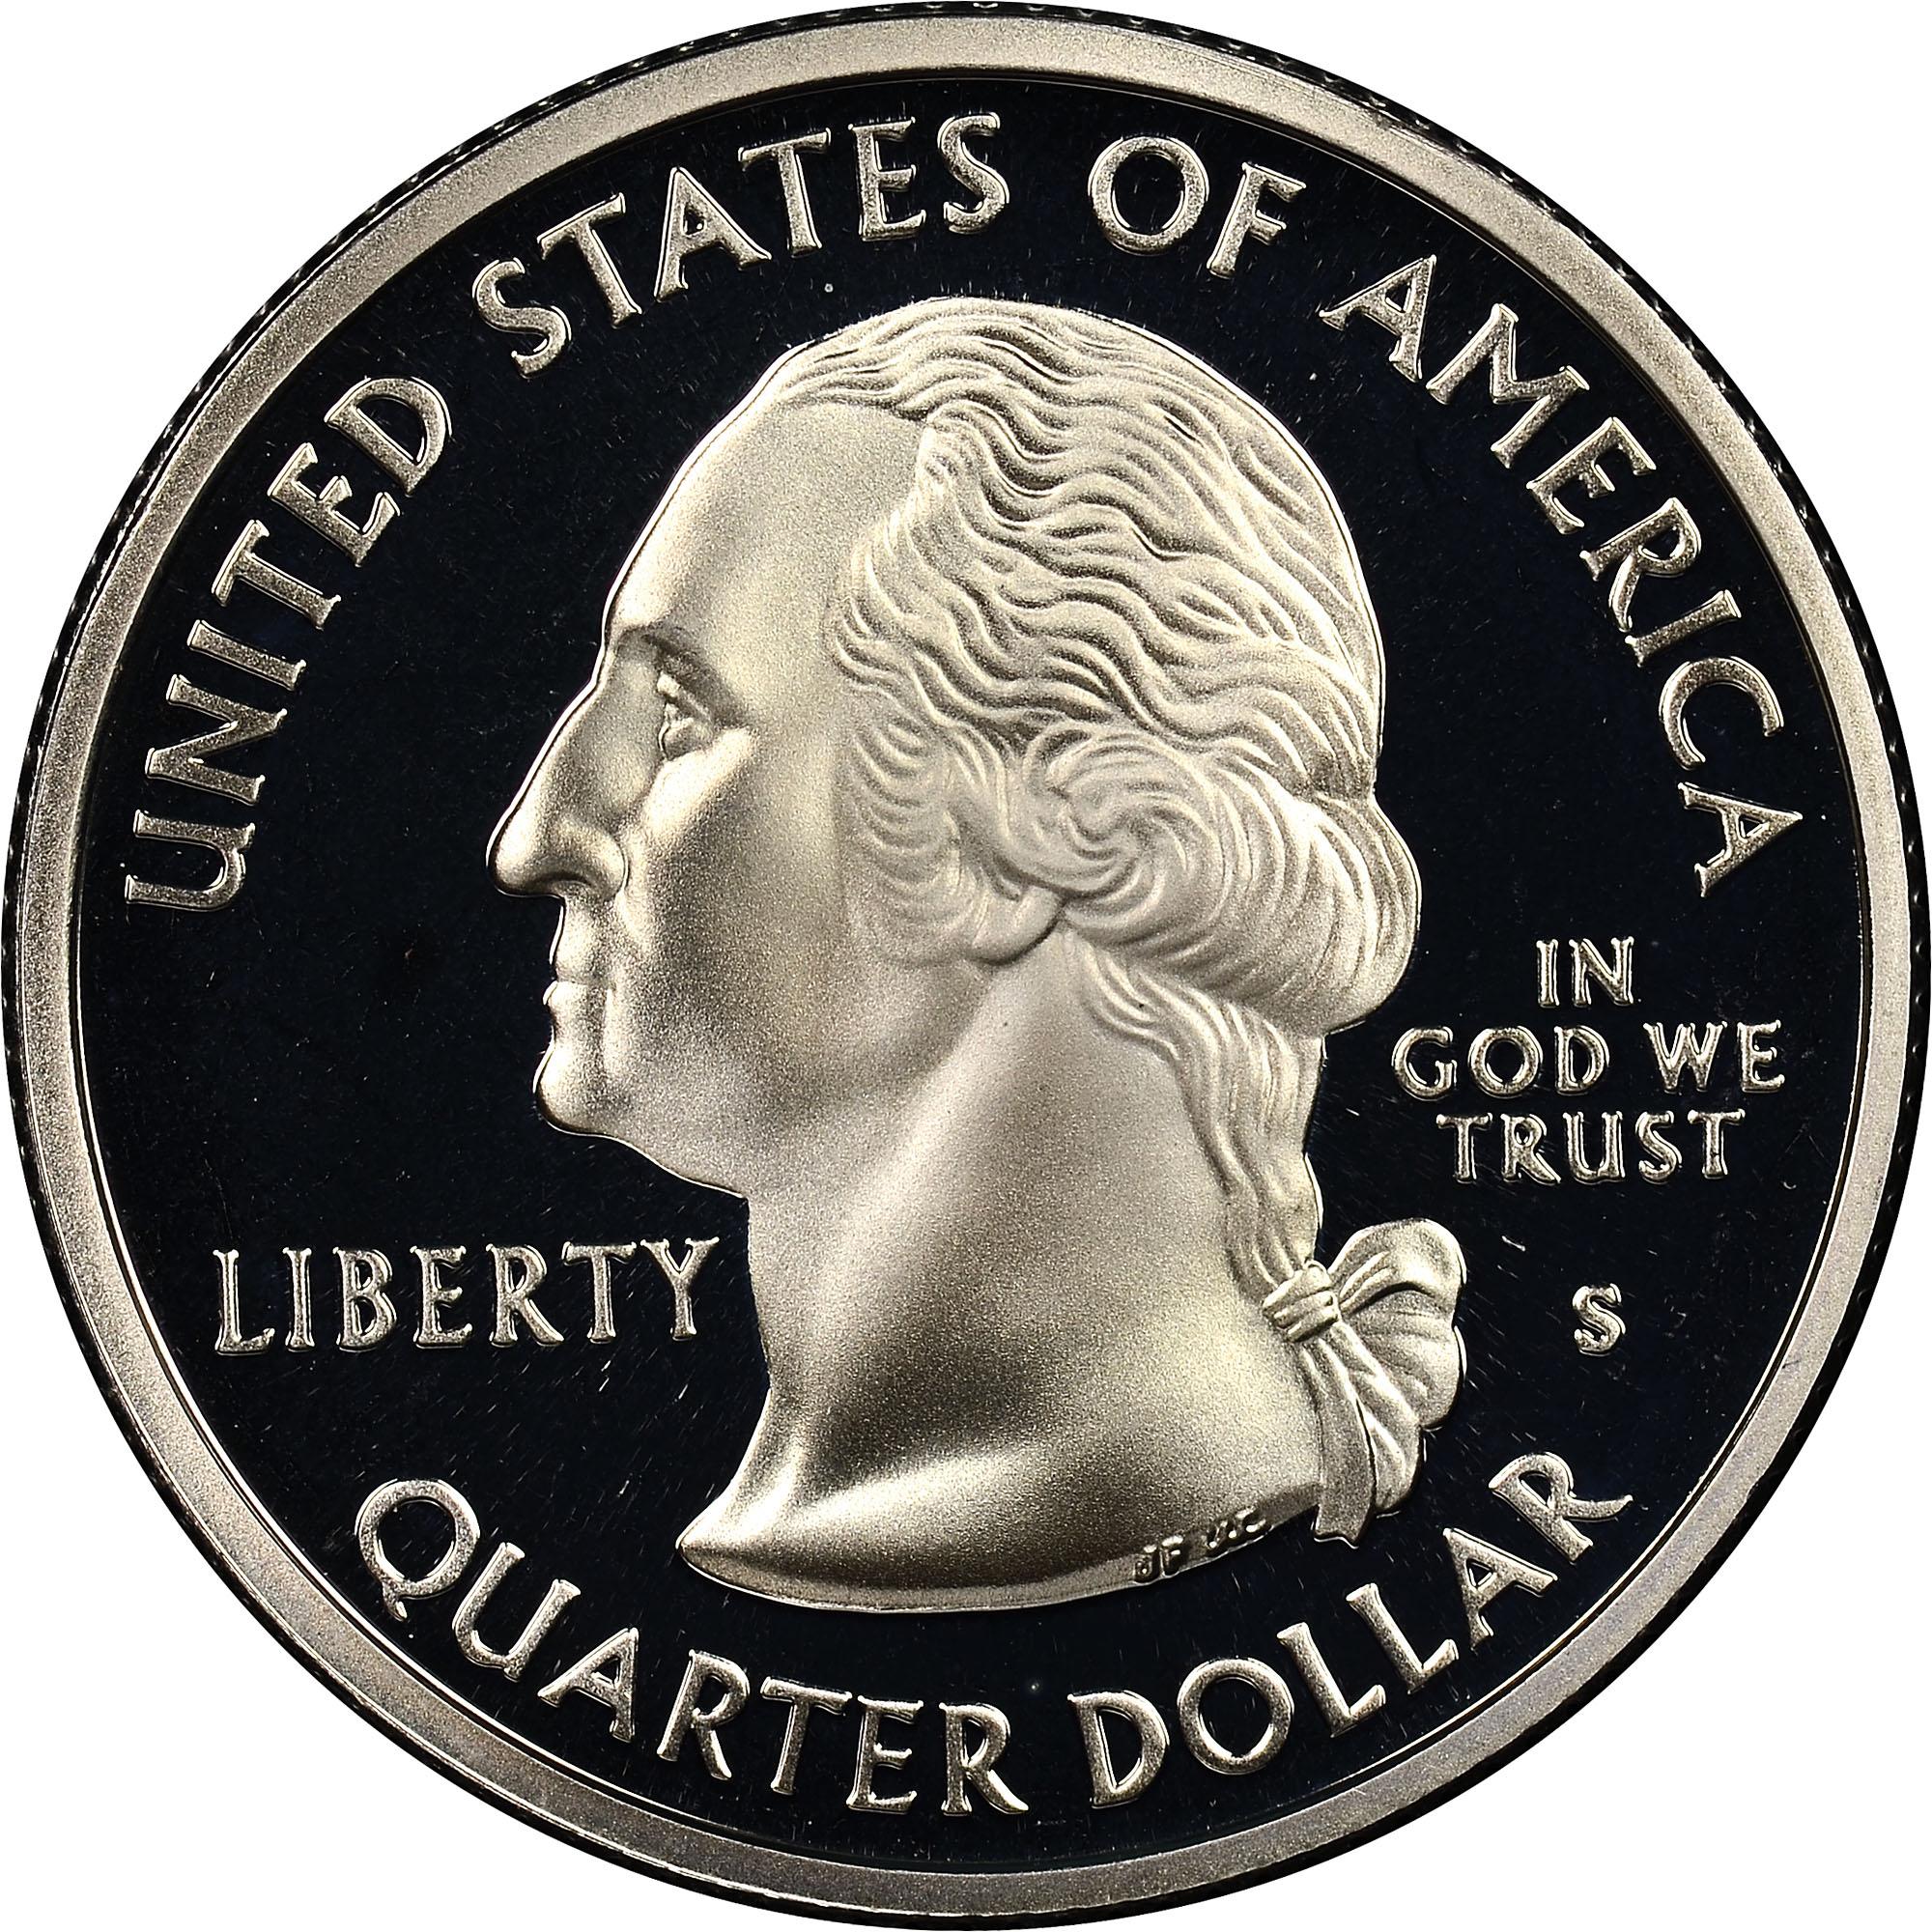 2004 s silver proof Iowa State quarter statehood series